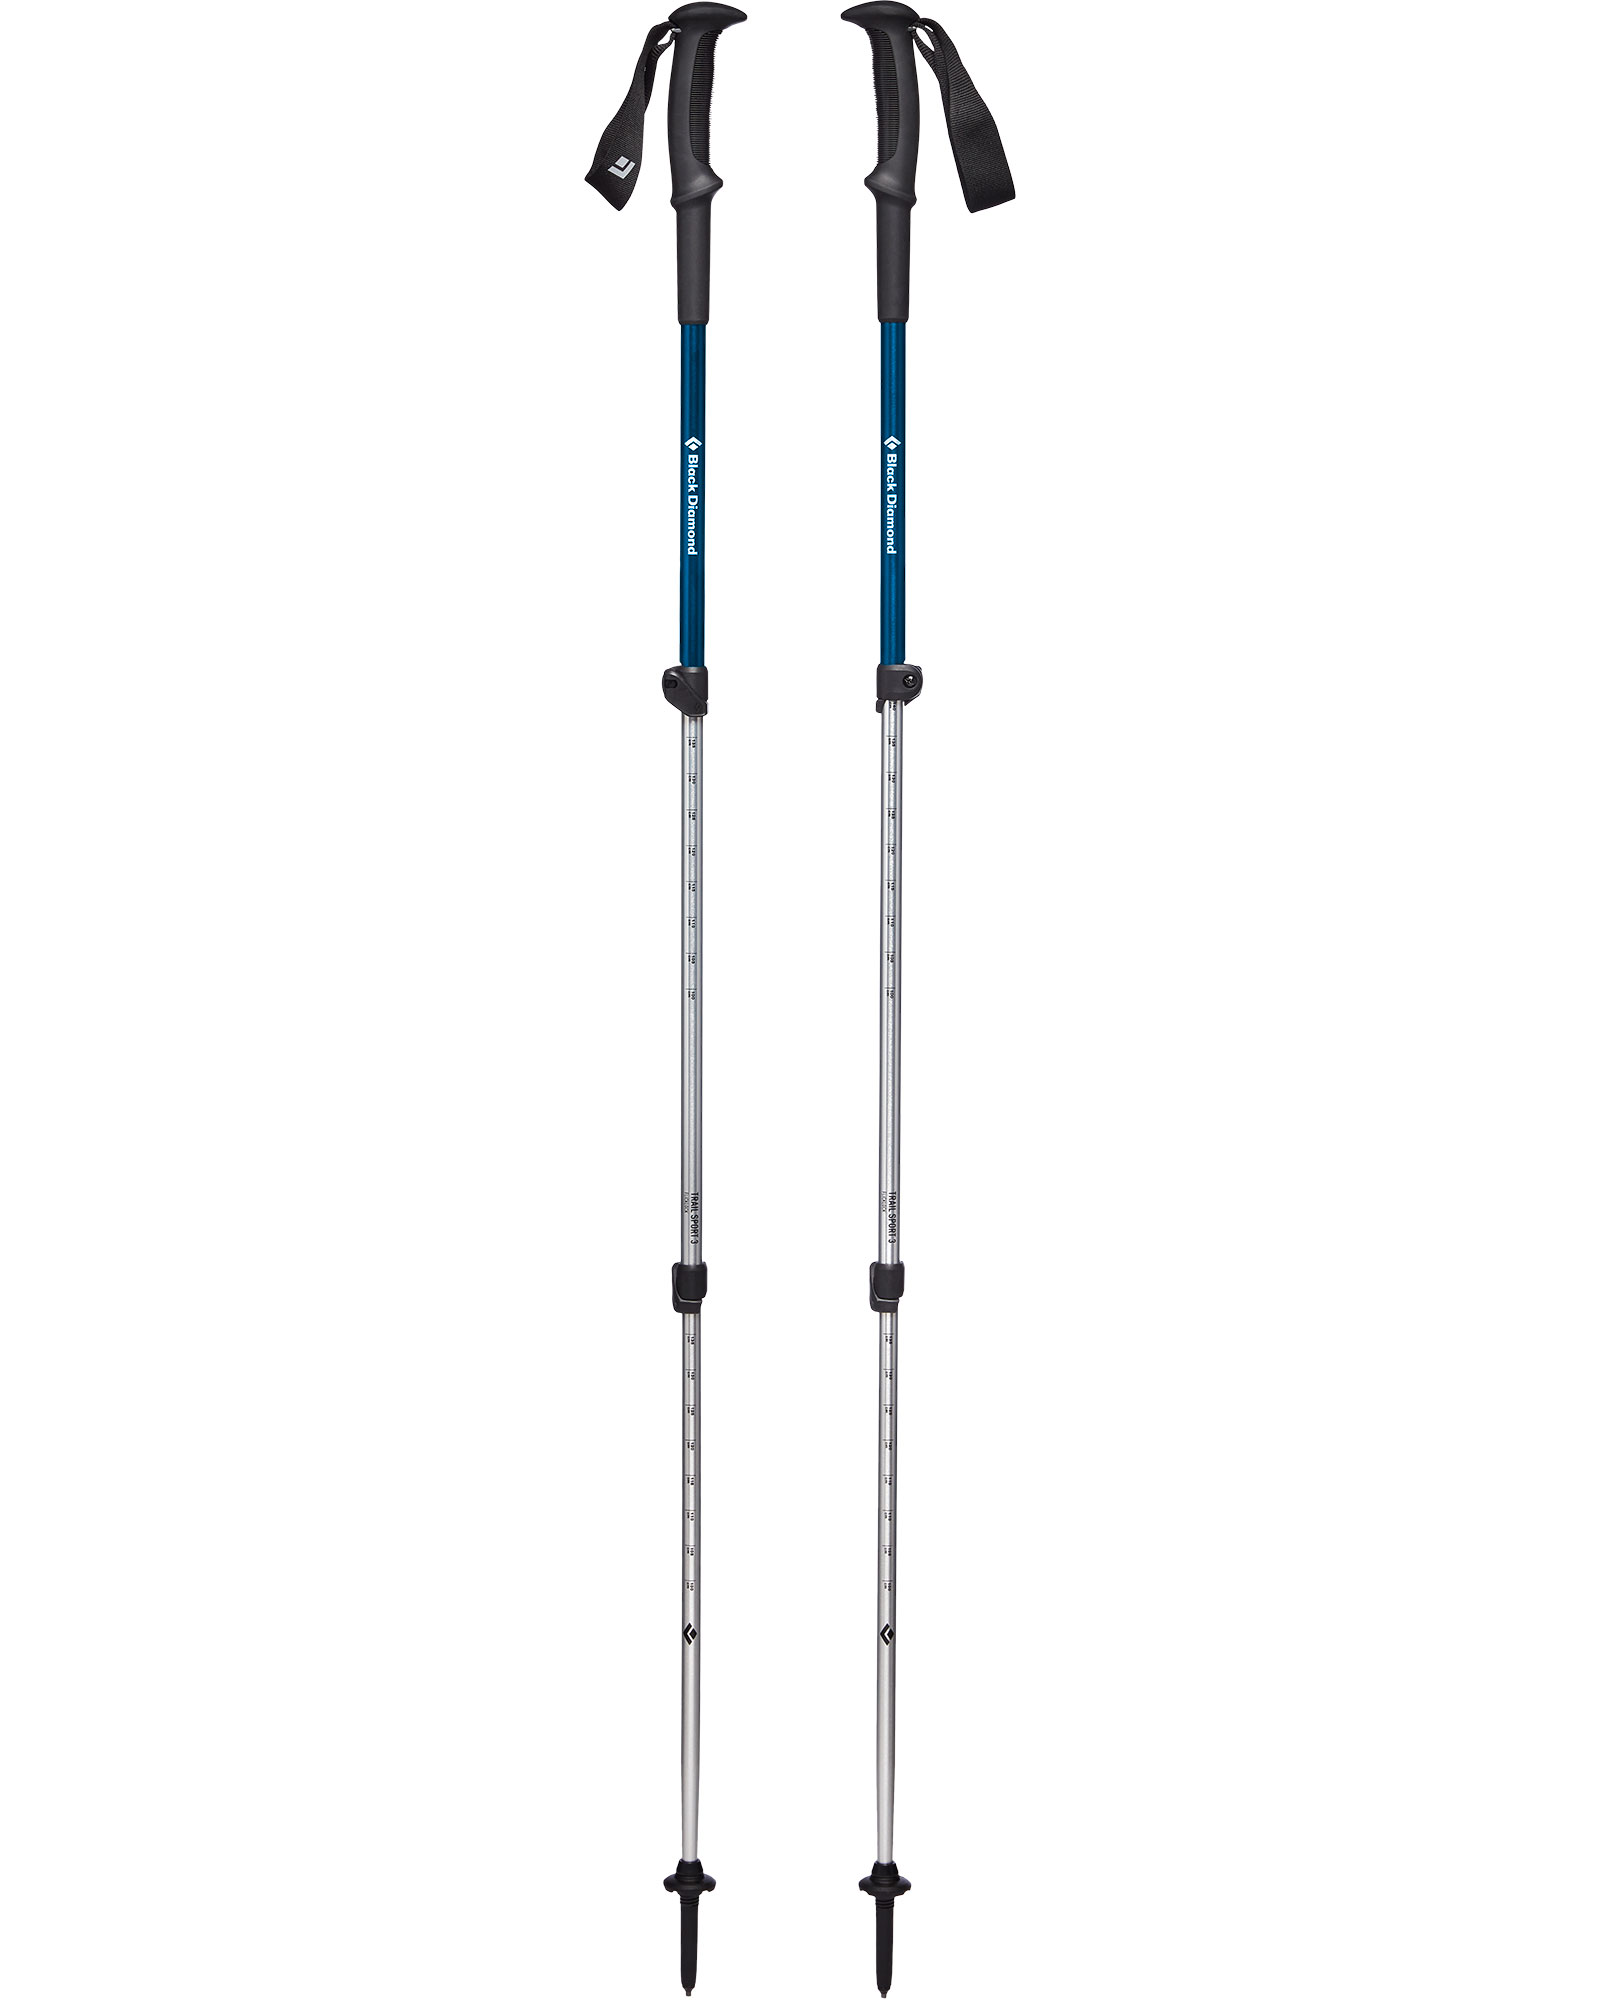 Black Diamond Trail Sport 3 Poles (Pair) 0